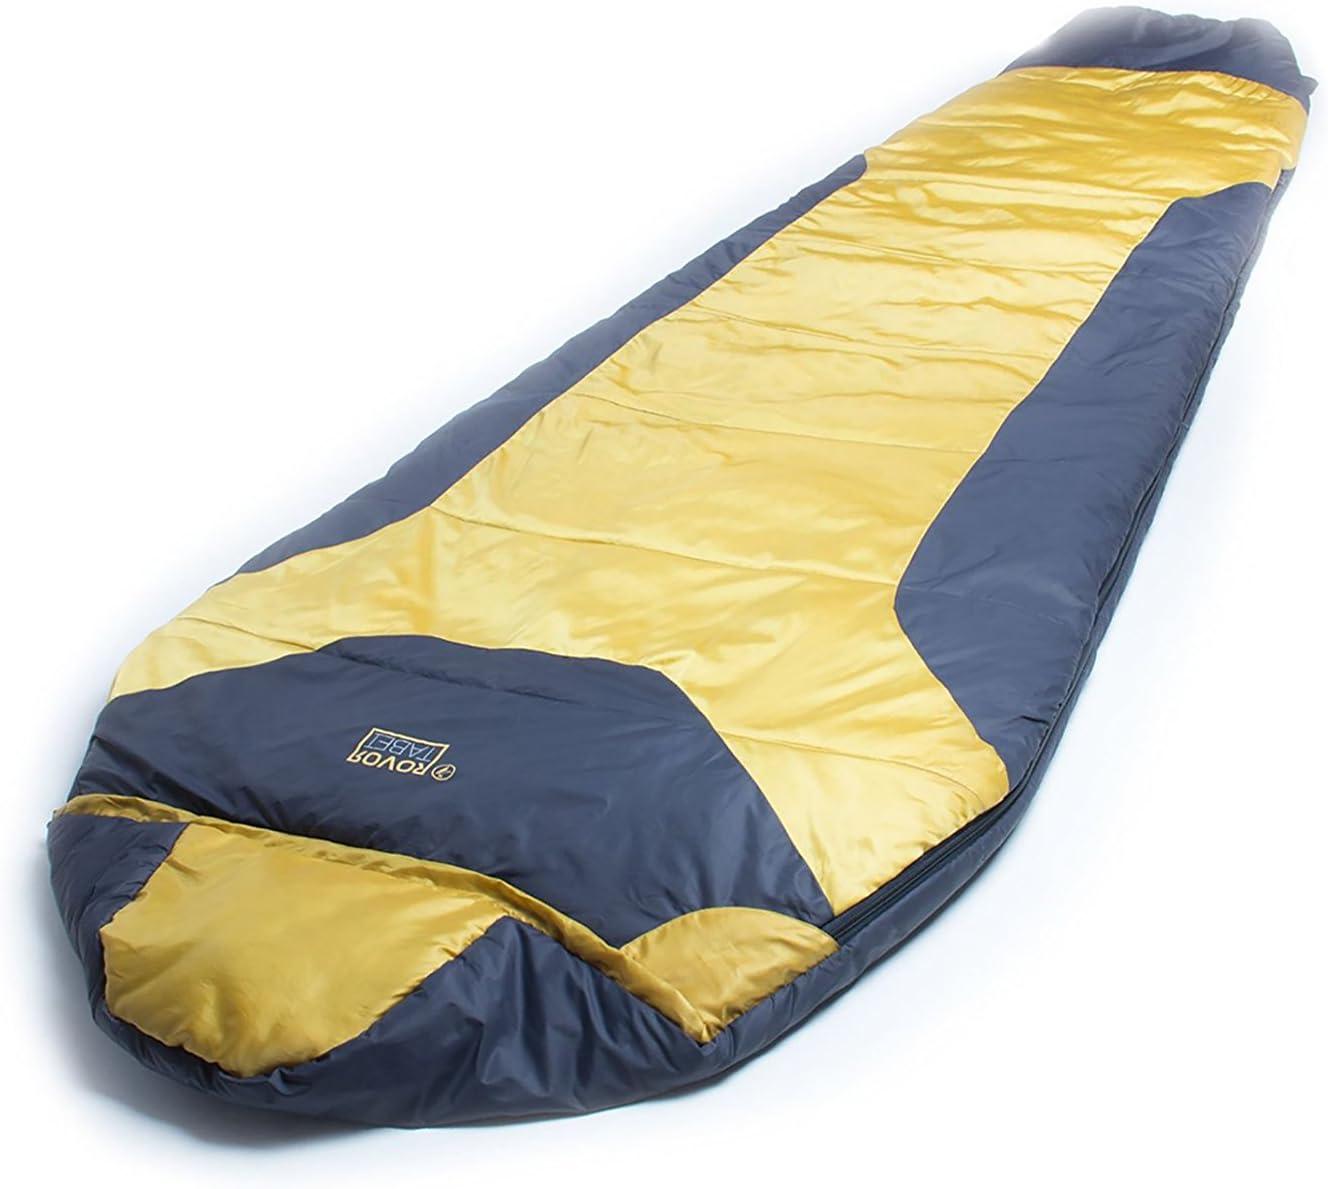 ROVOR Tabei 52 Degree Backpacking Sleeping Bag 71xleUPJjcL